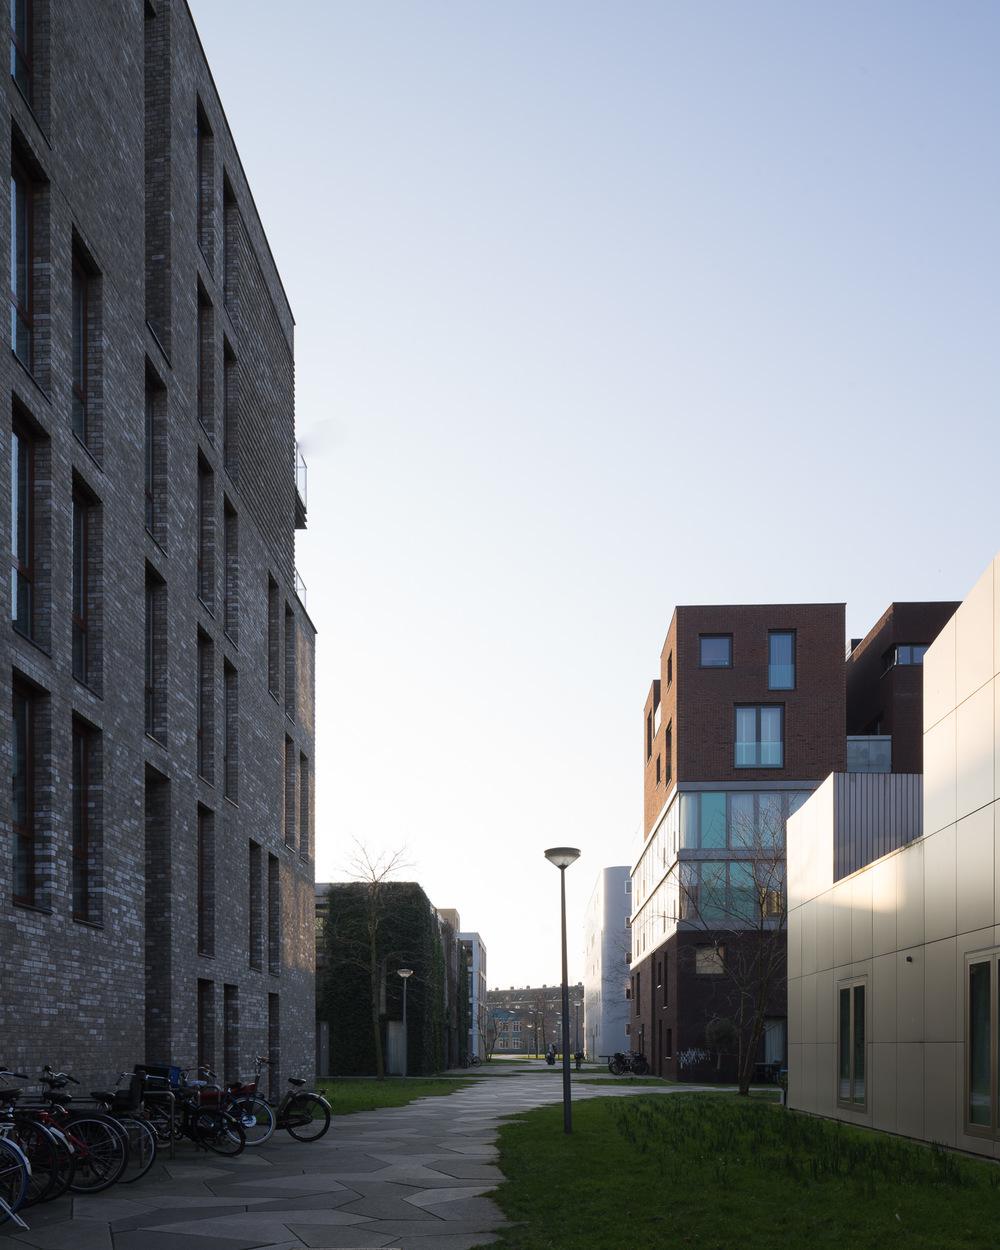 amsterdam-modern-architecture-facade-het-funen-mark-hadden-photography-architectuurfotograaf-006.jpg